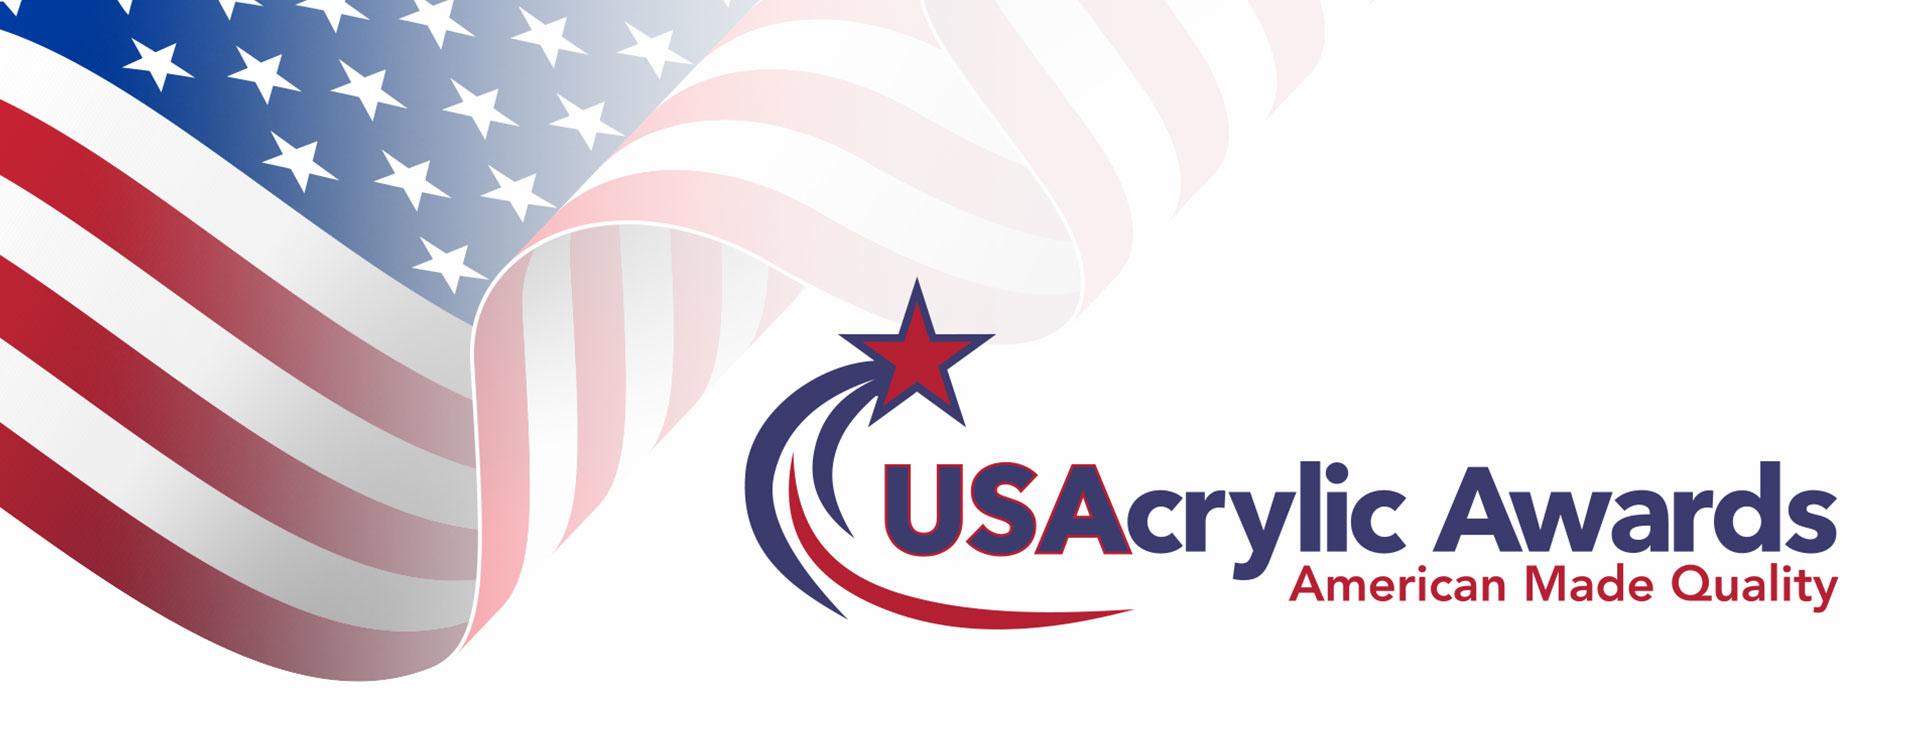 Waving American flag with US Acrylic Awards logo.